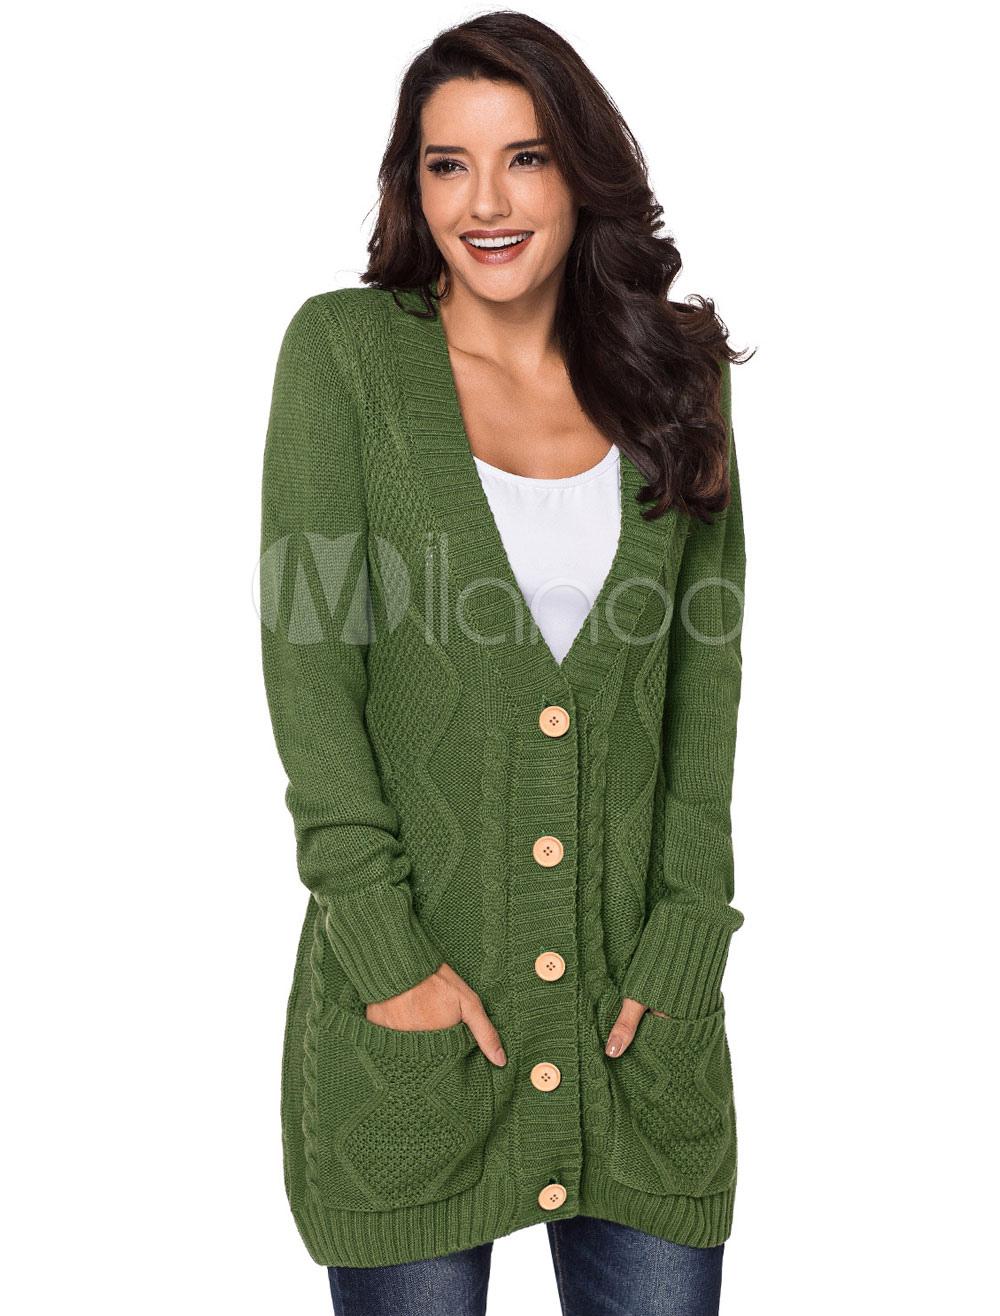 6df36f6514 ... Suéter Cardigan Mujer bolsillos de botones de manga larga gris prendas  de vestir exteriores-No ...